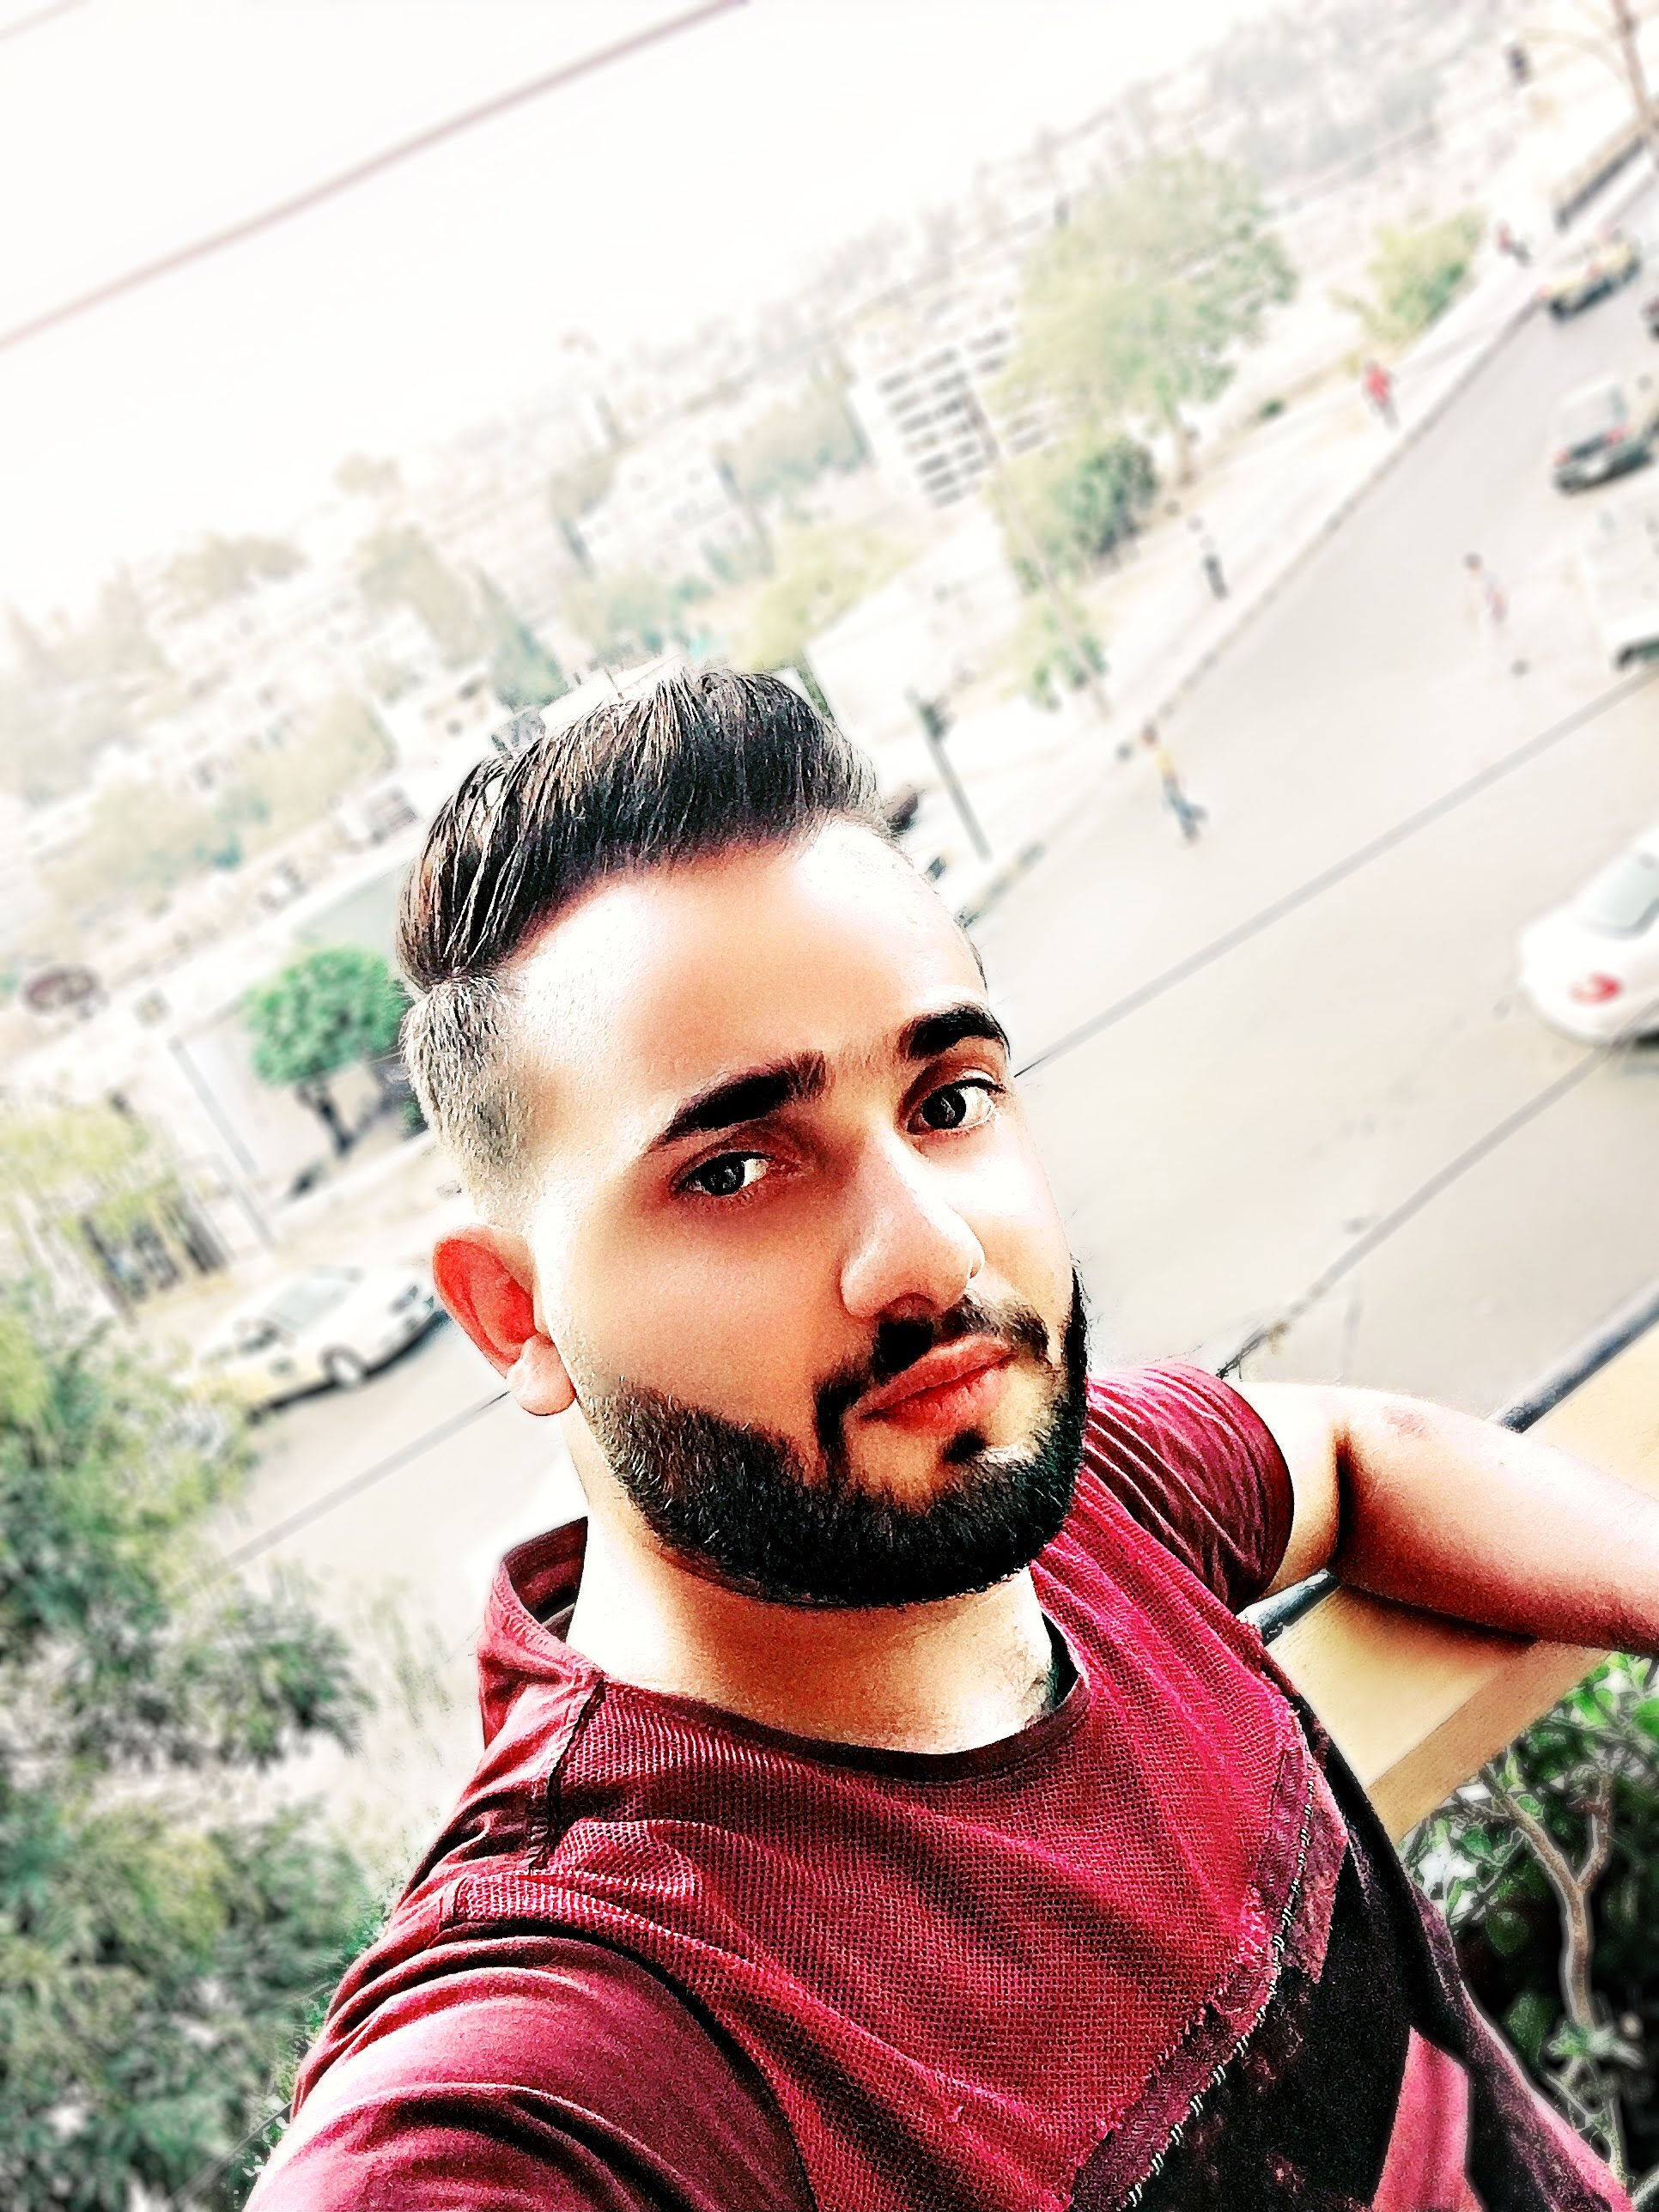 Mohammad Khatib